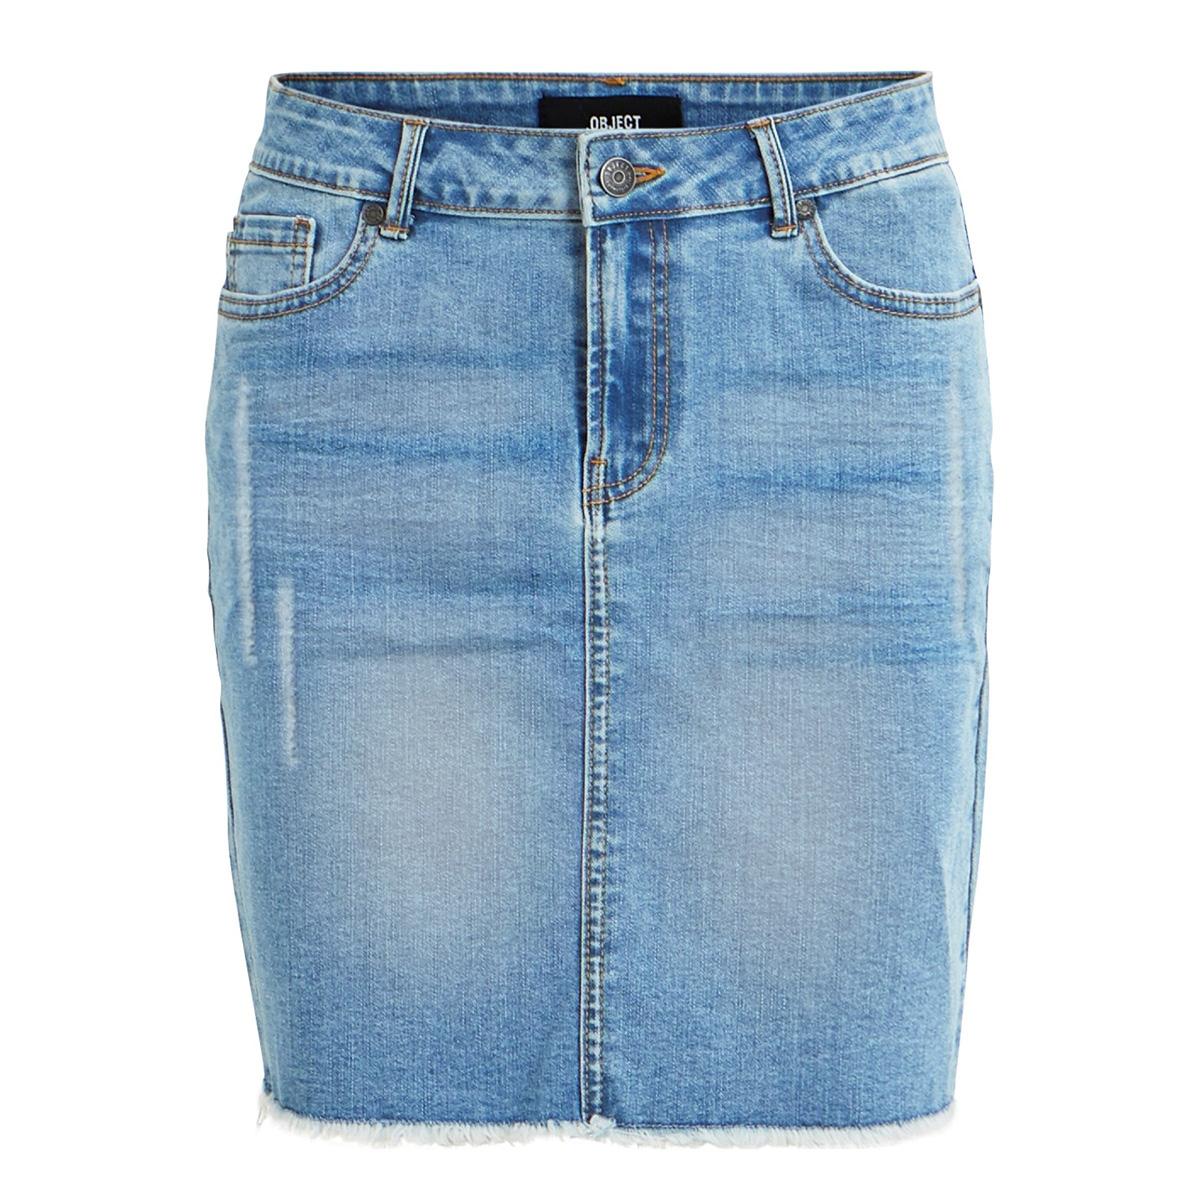 objsarah mw skirt light blue 101 di 23029855 object rok light blue denim